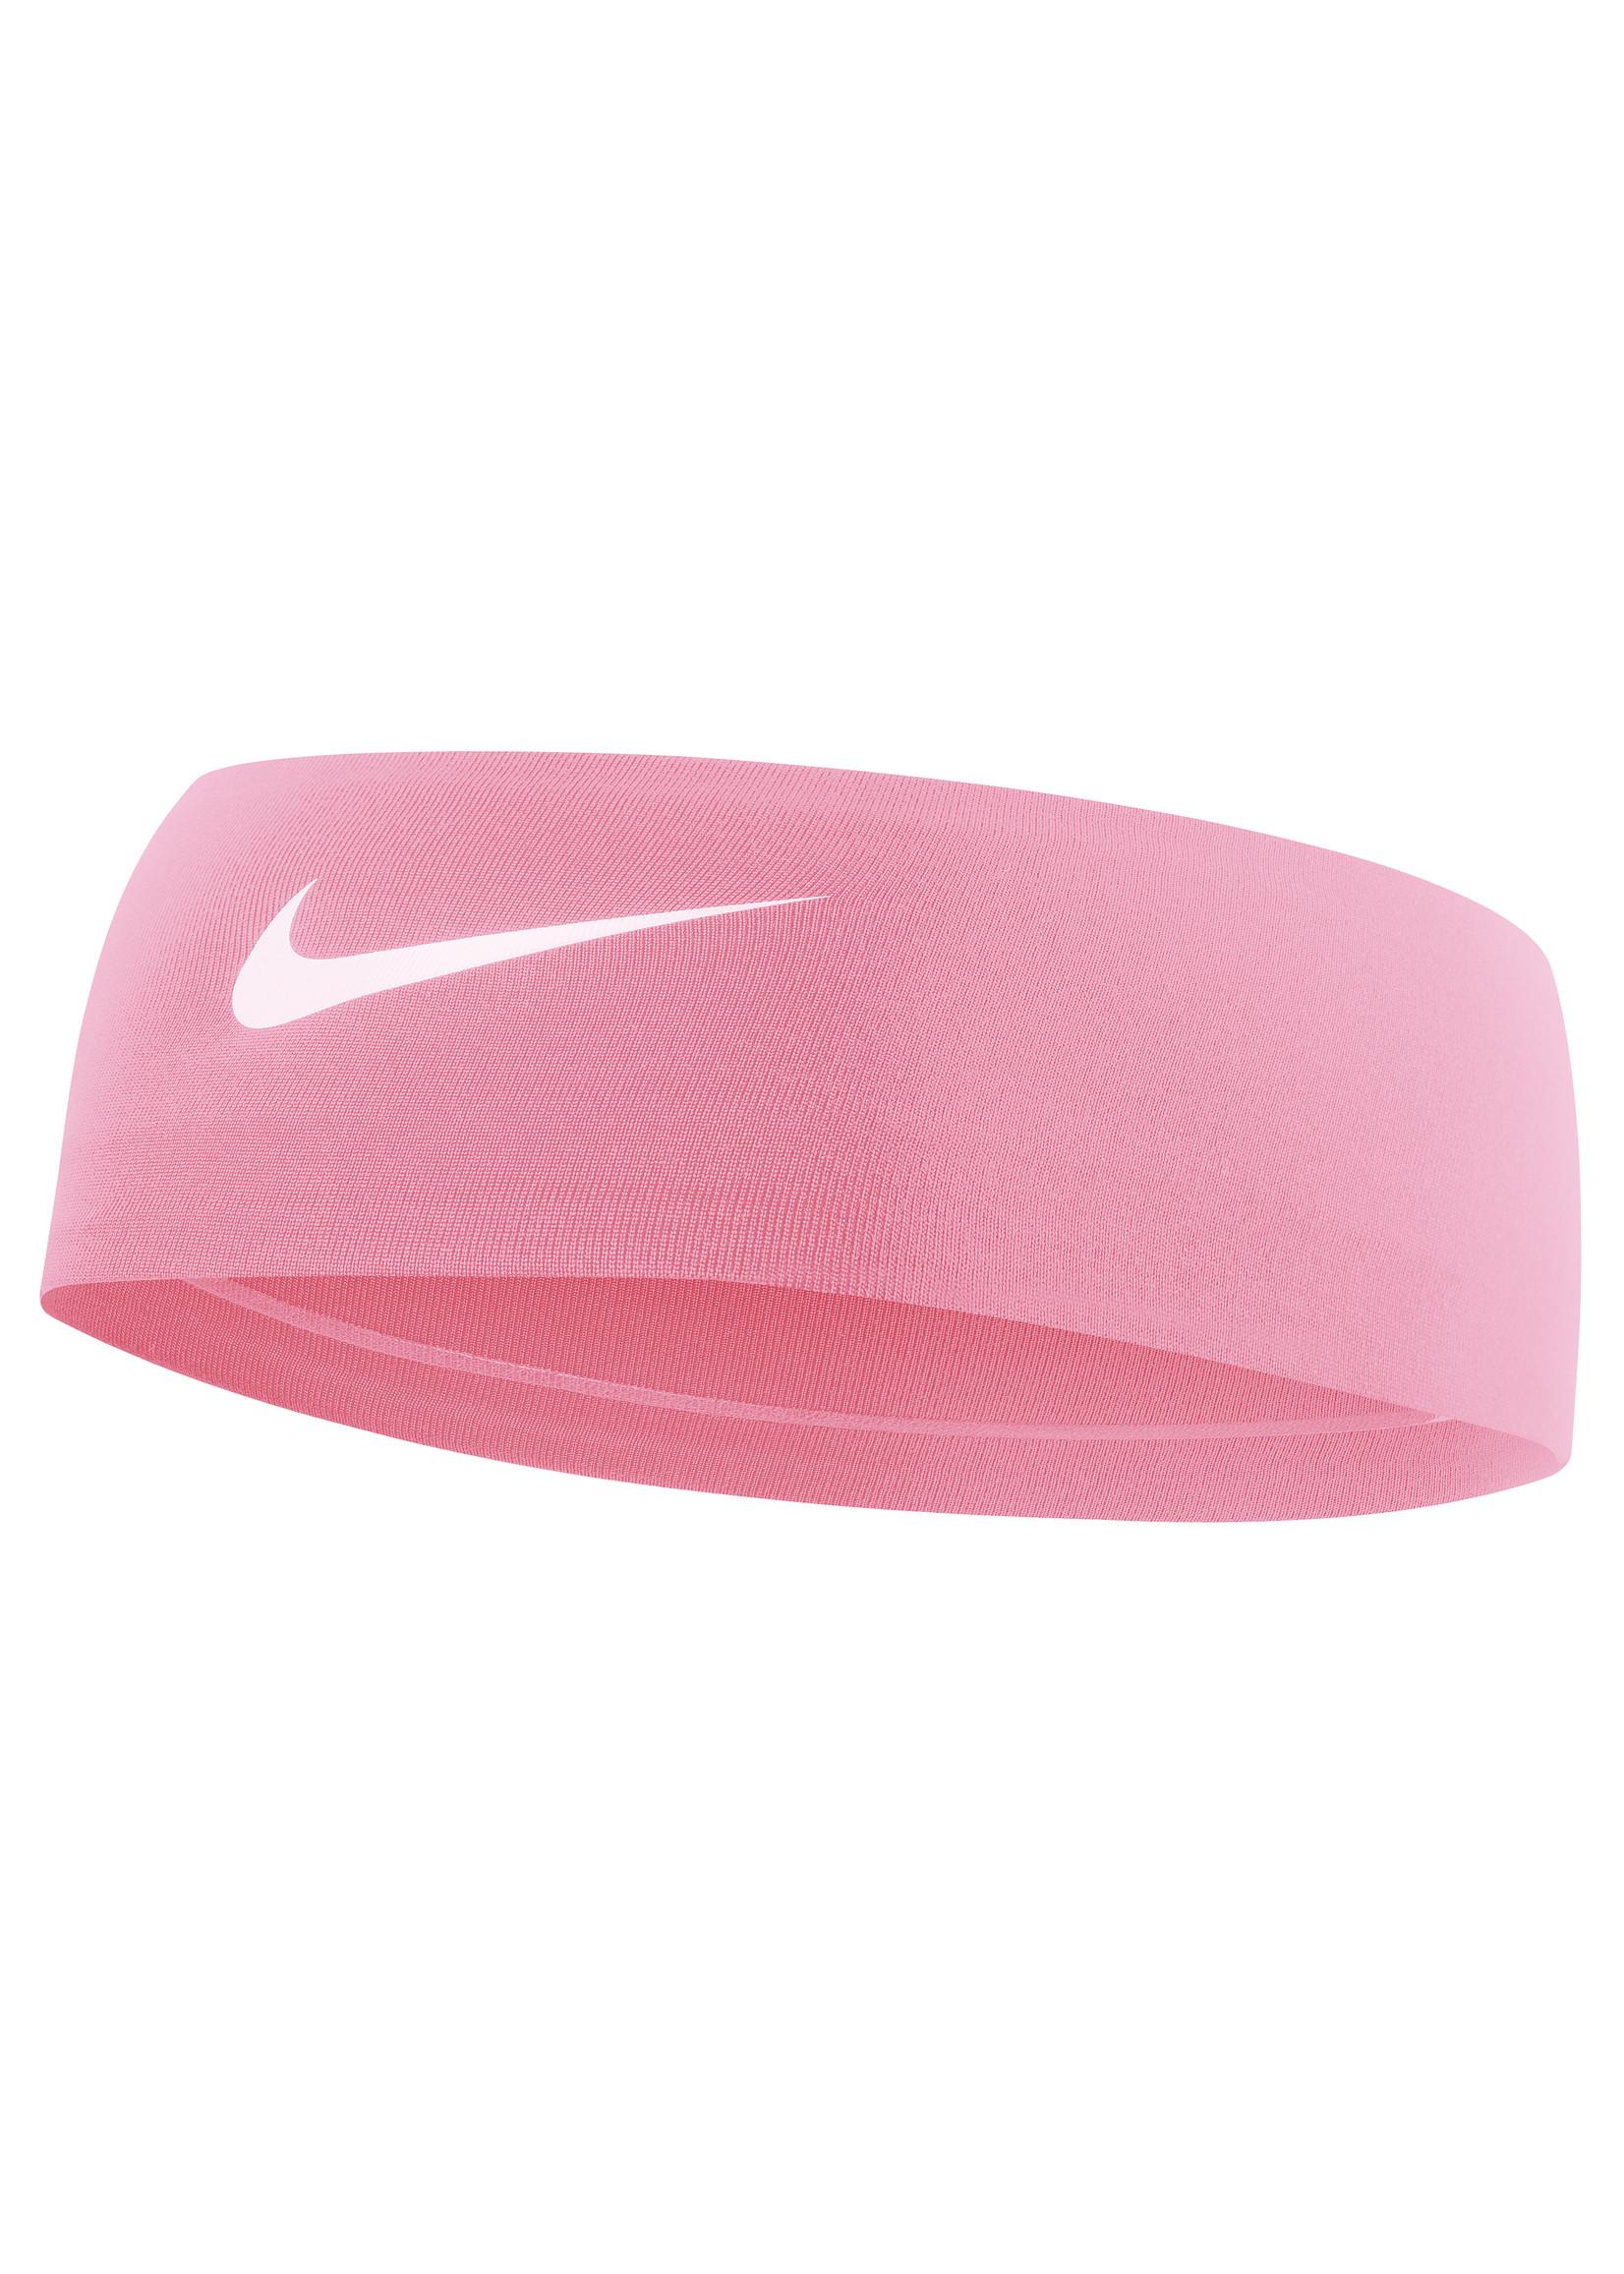 Nike Fury Headband 2.0 Pink/ White Youth